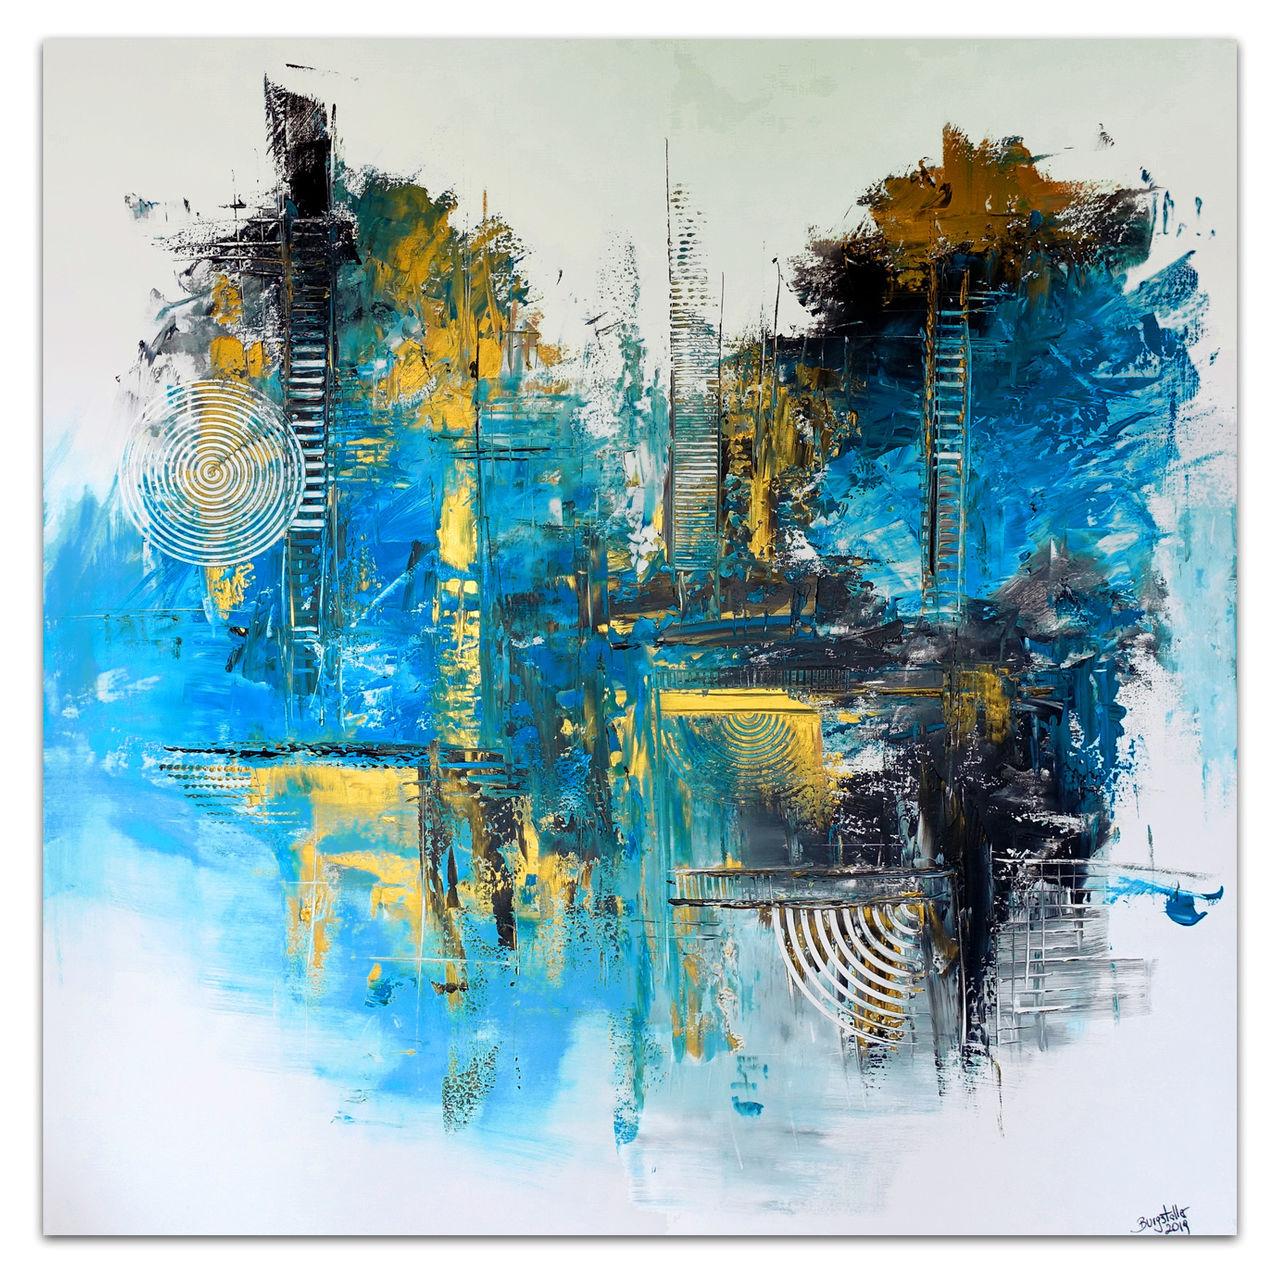 Wandbild Abstrakte Malerei Blau Grau Gold Moderne Kunst Bilder Acrylmalerei Wandbild Malen Abstrakte Malerei Von Burgstallers Art Bei Kunstnet